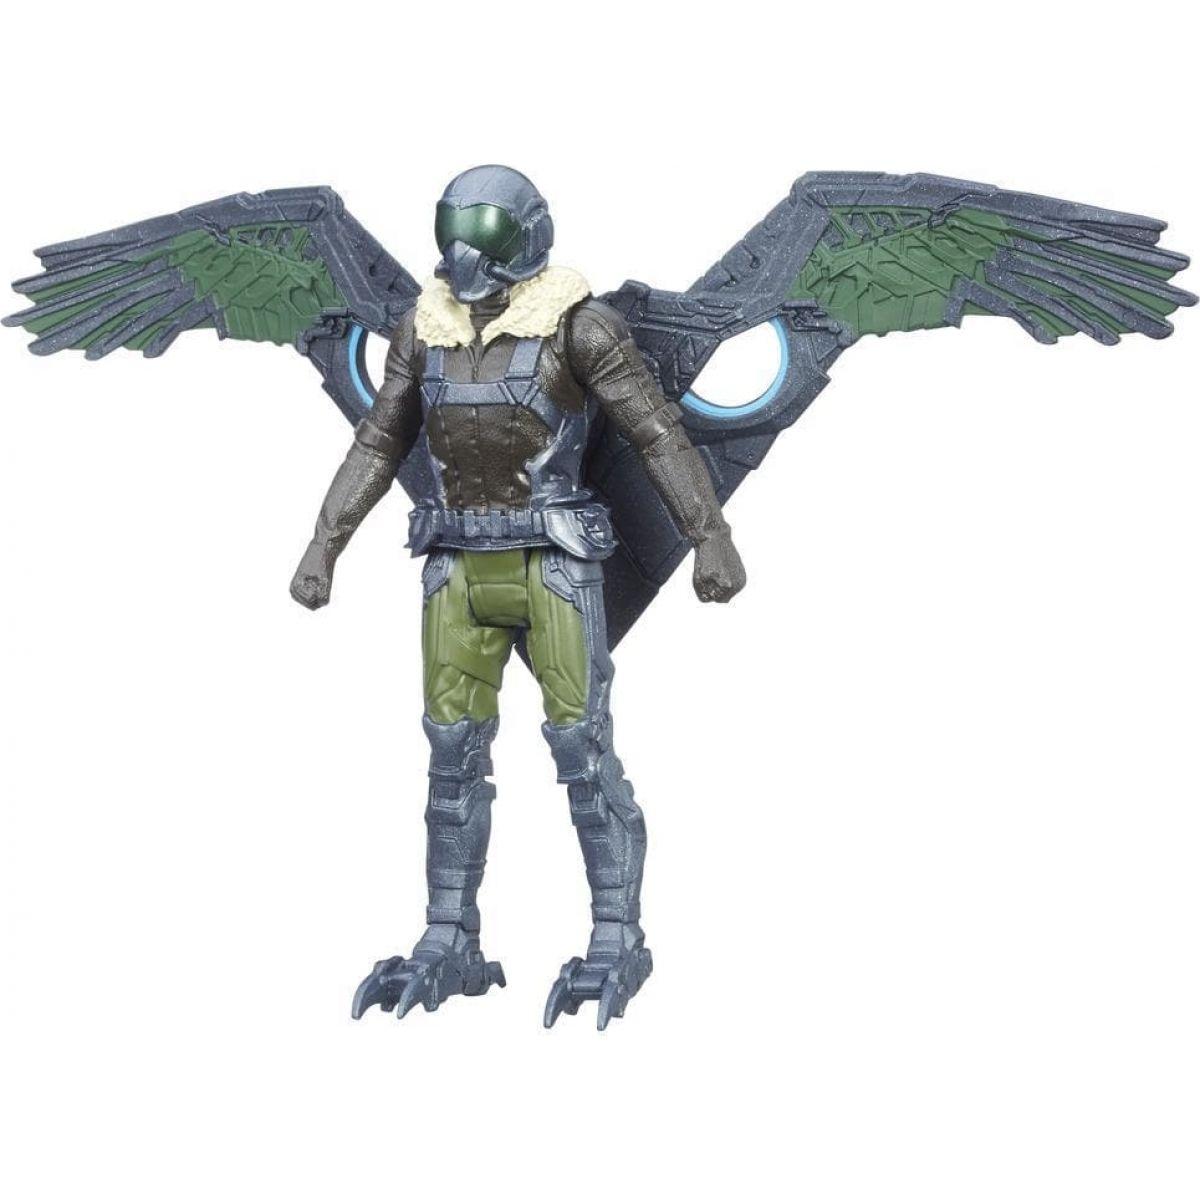 Hasbro Spider-man 15 cm Vulture